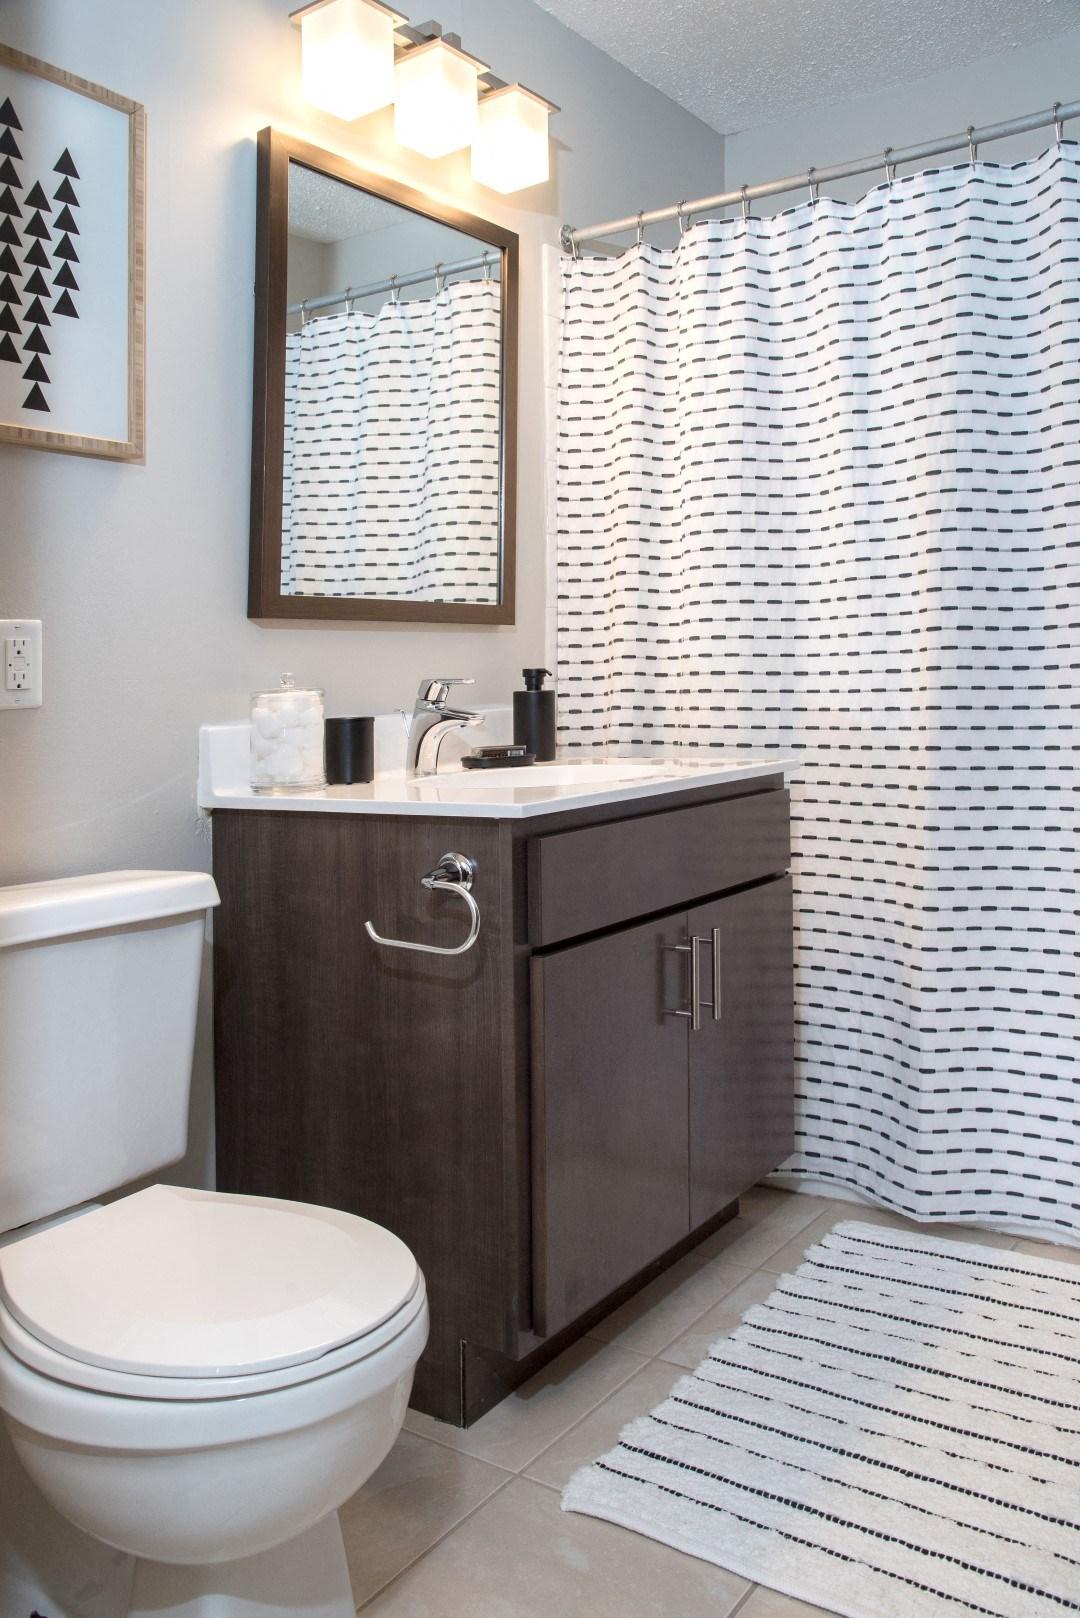 Bathroom Accessories at Eagan Place Apartments, Eagan, 55123